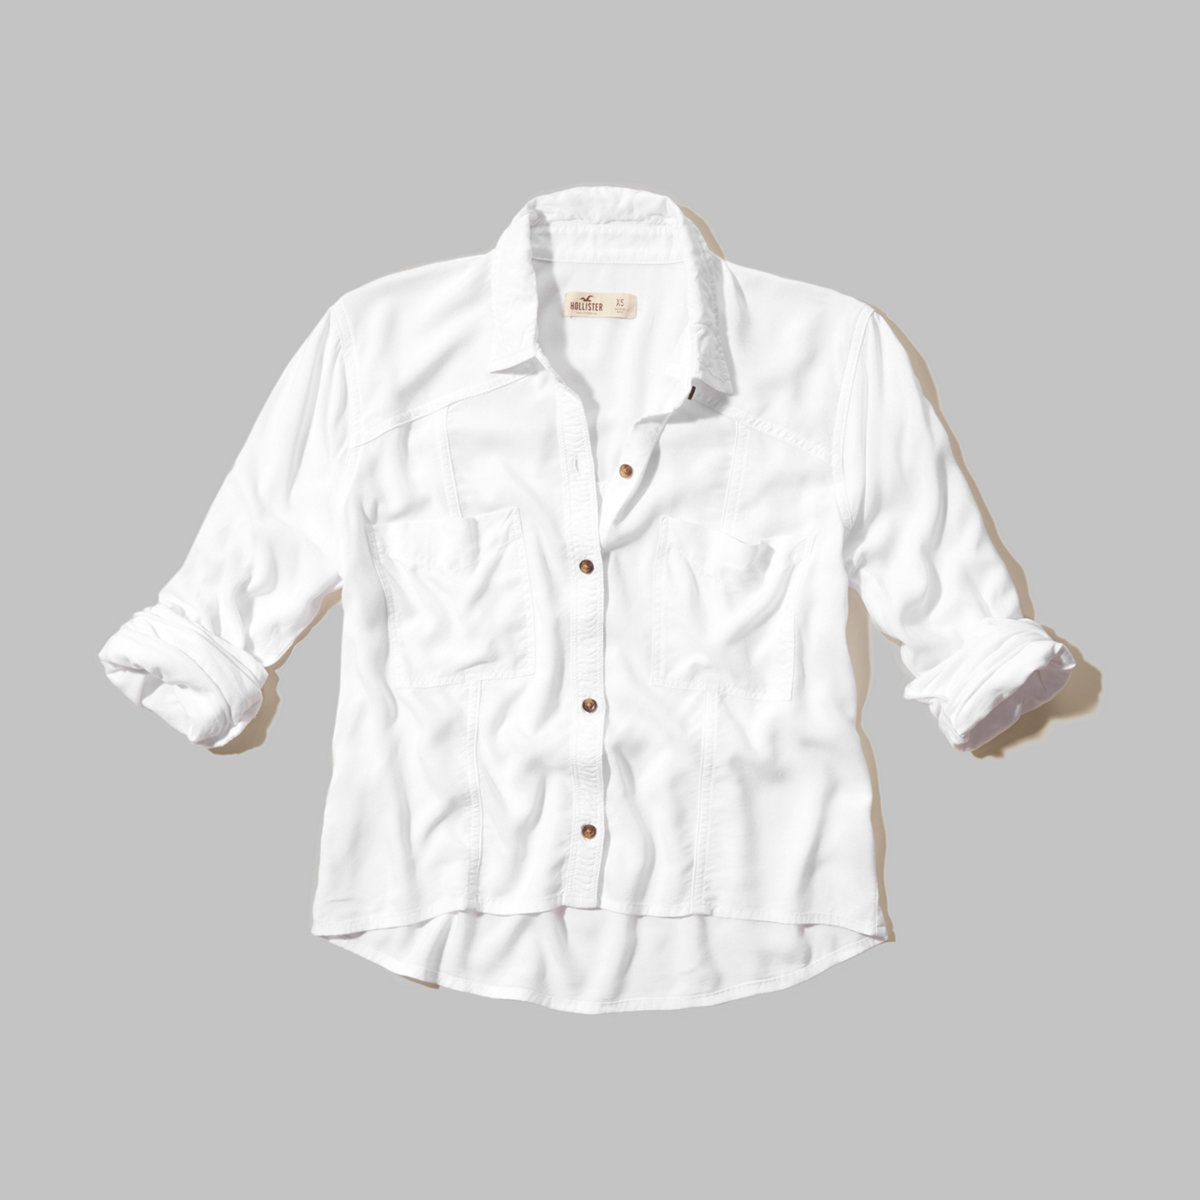 Costa Mesa Cropped Shirt